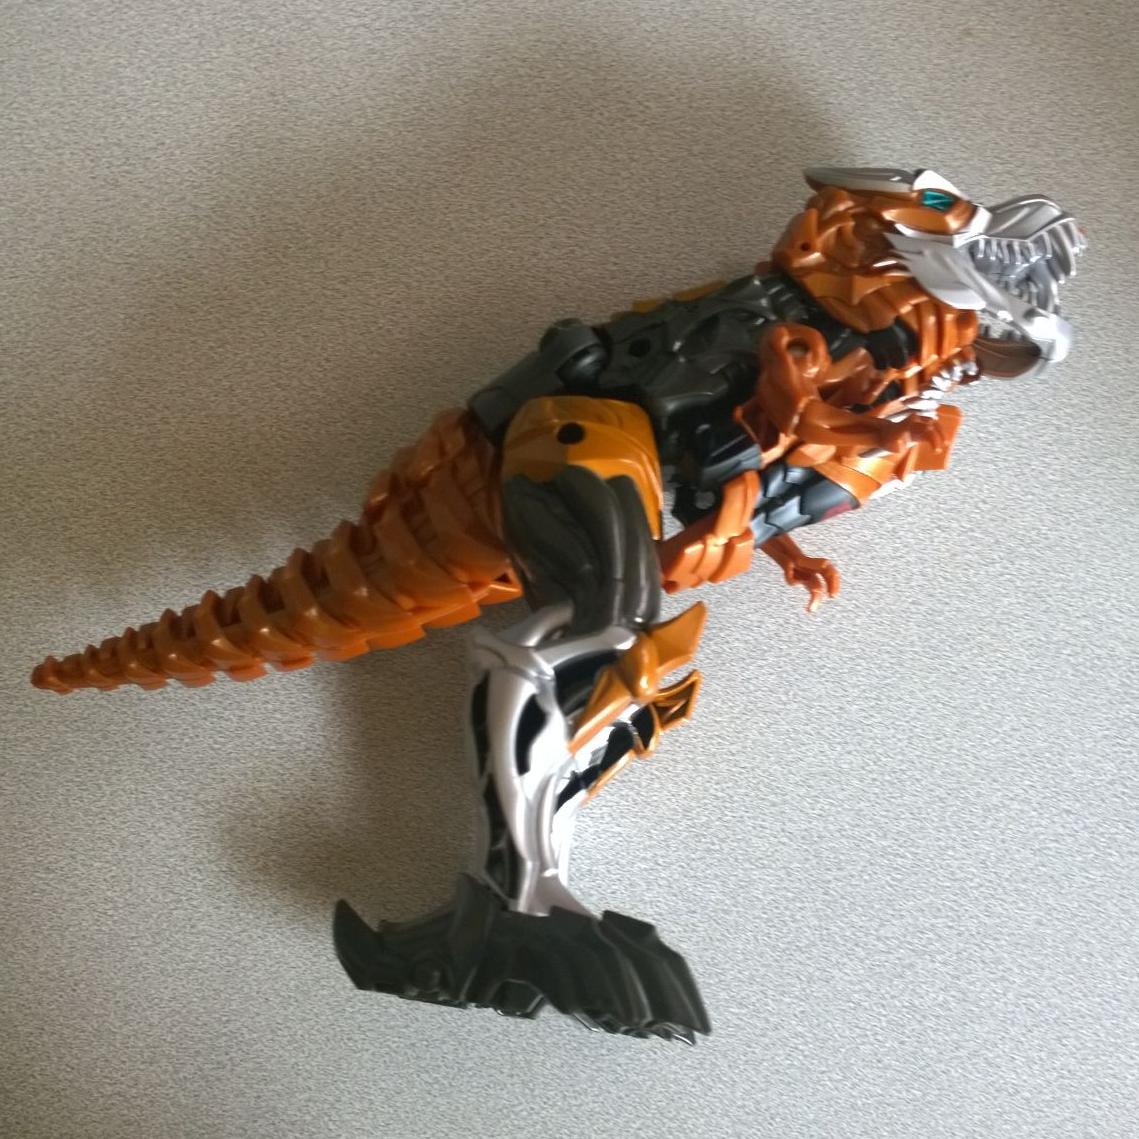 Grimlock Transformers Custom Legends Robots Age of Extinction Action Figure